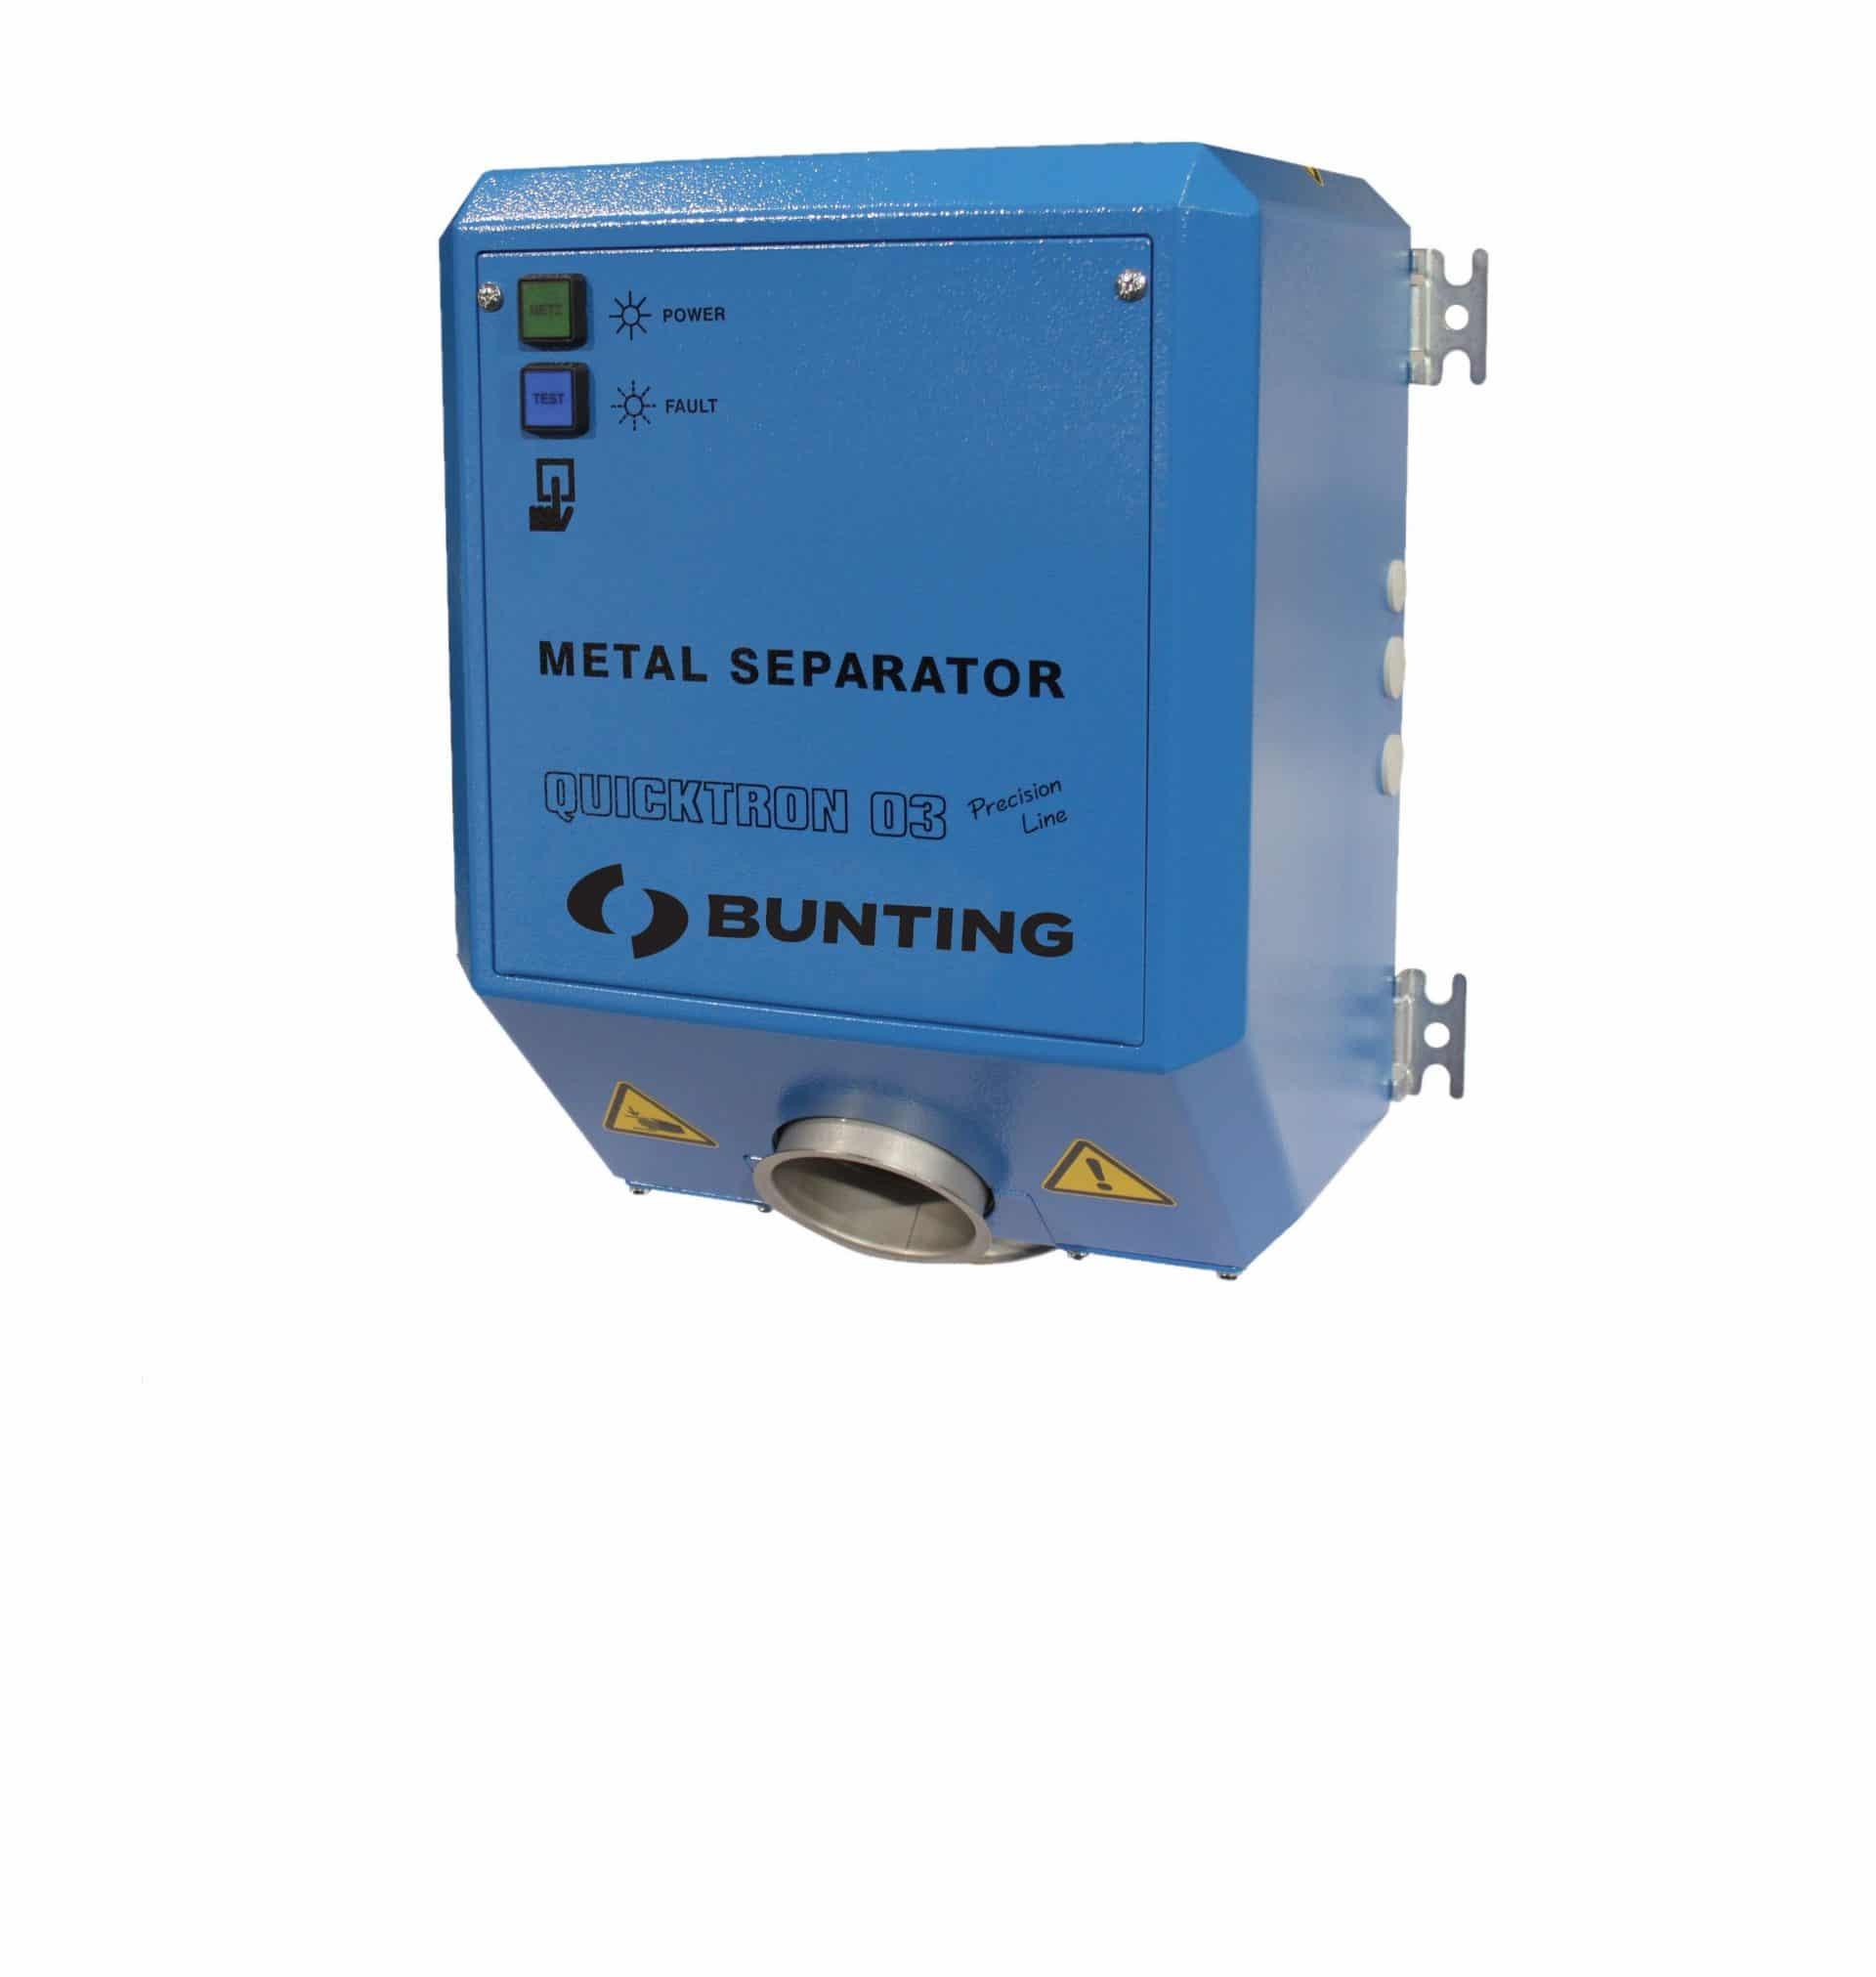 Metal Separator QuickTron